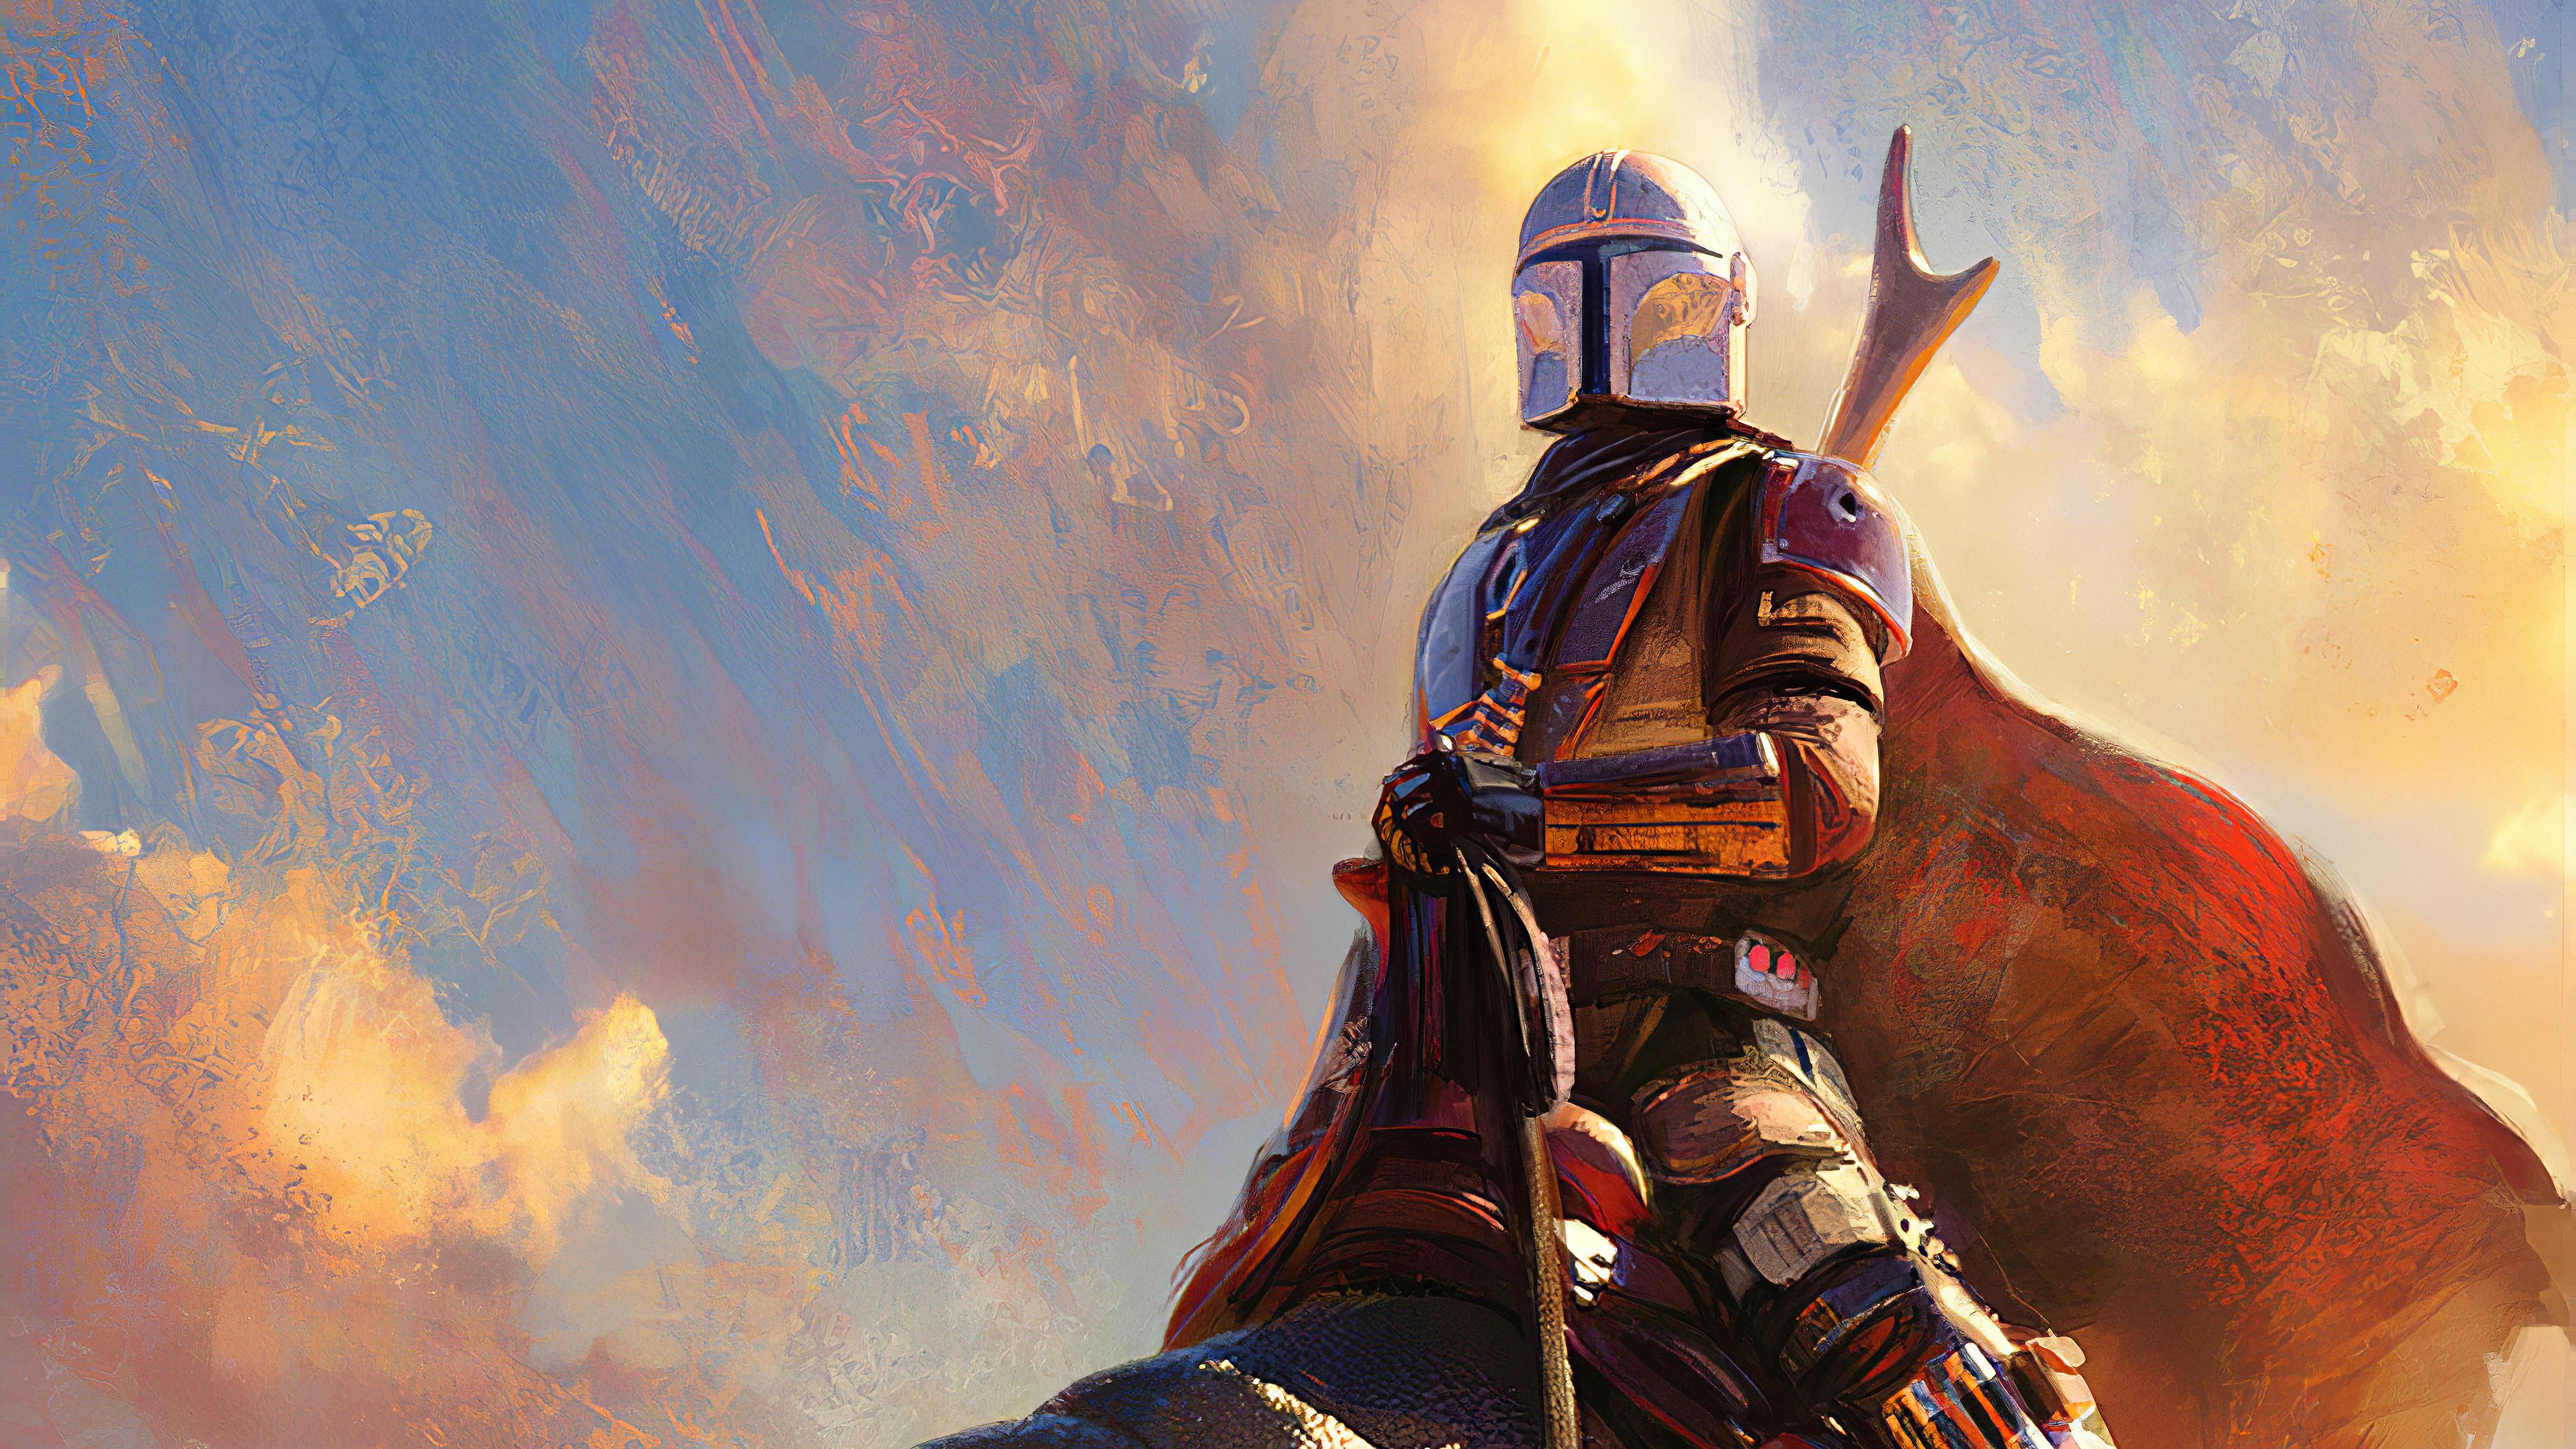 Star Wars Mandalorian Wallpaper 4k